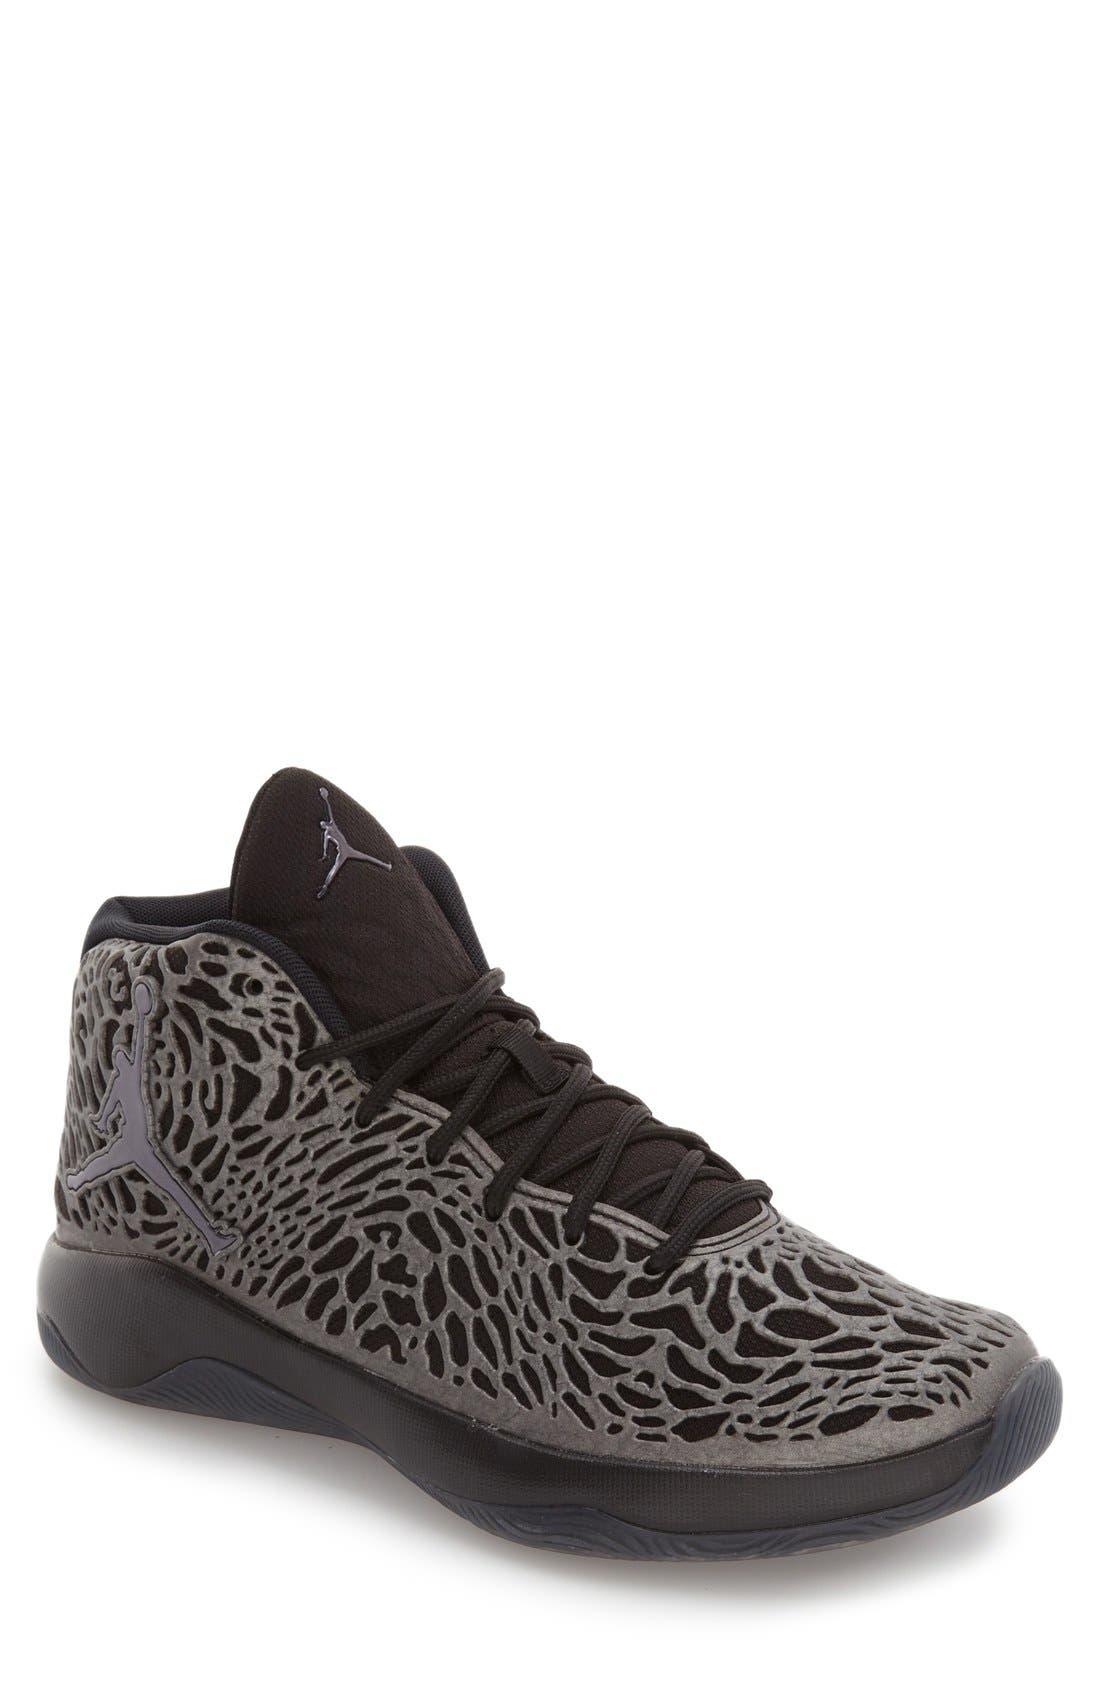 Alternate Image 1 Selected - Nike Jordan Ultra.Fly High Top Sneaker (Men)